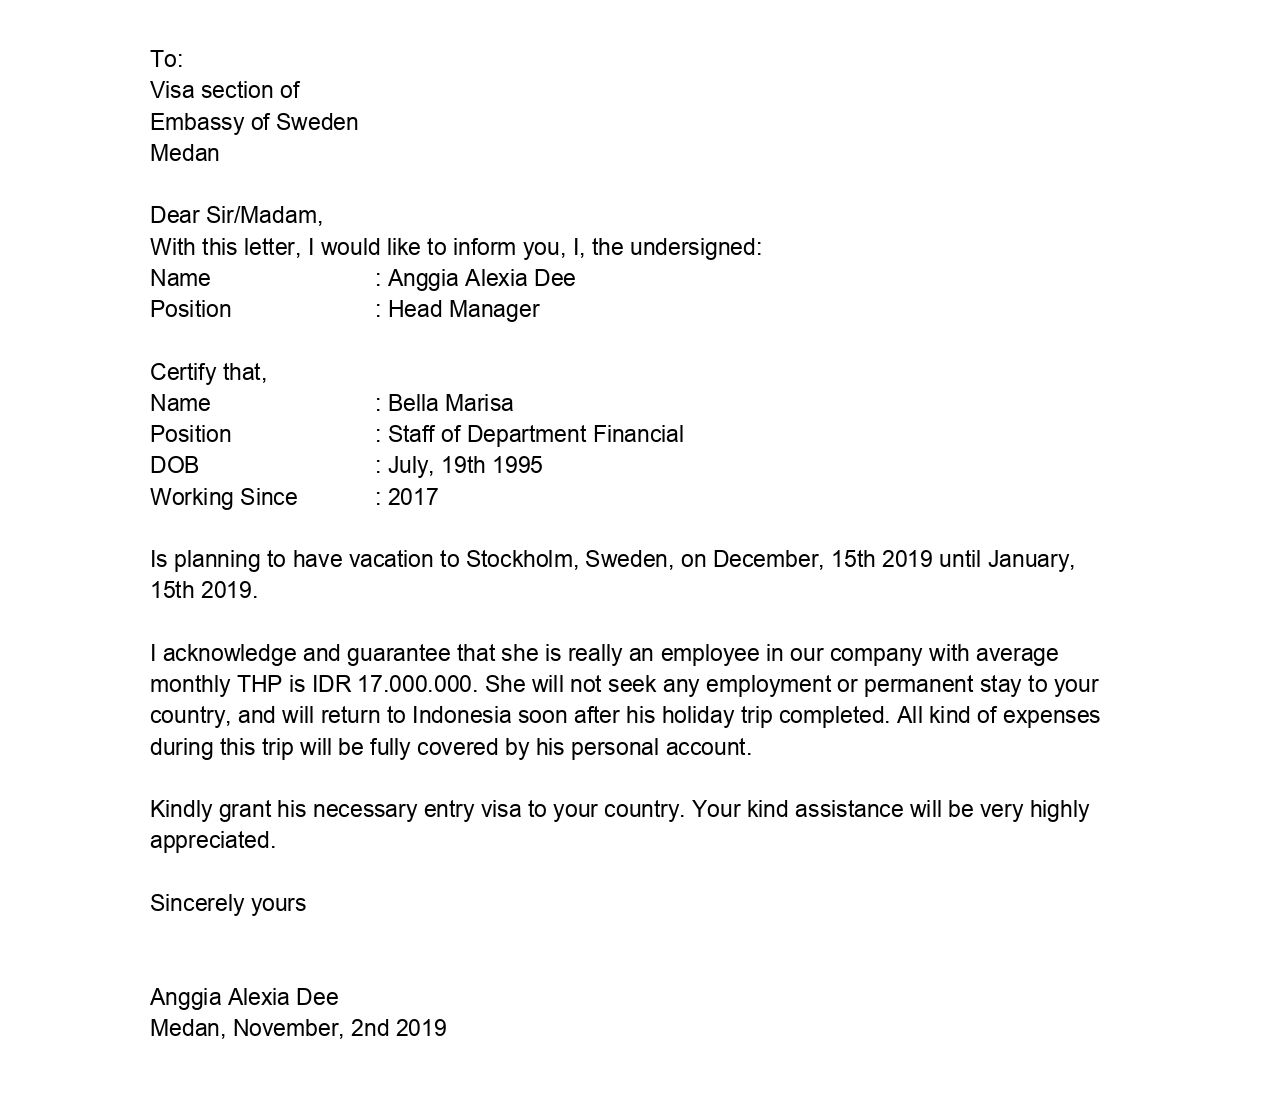 Contoh Surah Keterangan Karyawan Untuk Segala Keperluan - 005